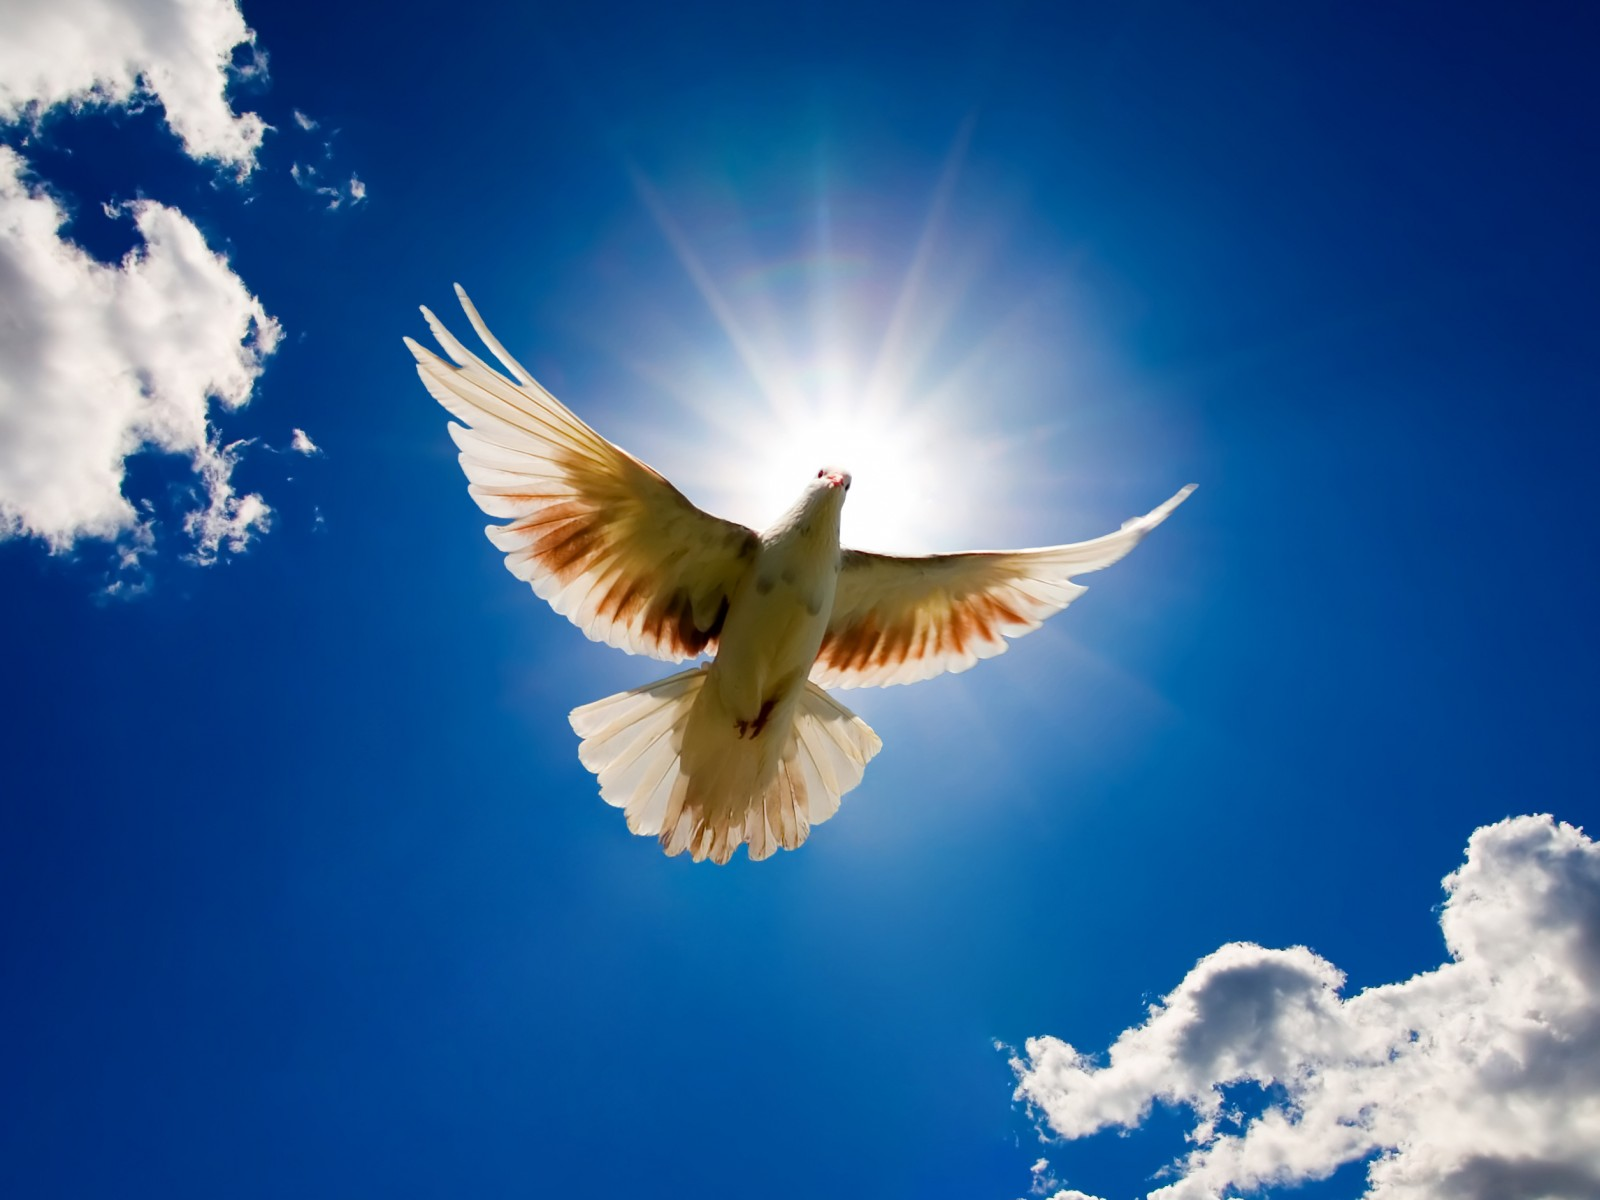 http://2.bp.blogspot.com/_YSCS9FLBbIo/TQbxPoTf2-I/AAAAAAAAArQ/vdDU8uahT6k/s1600/pomba-da-paz.jpg